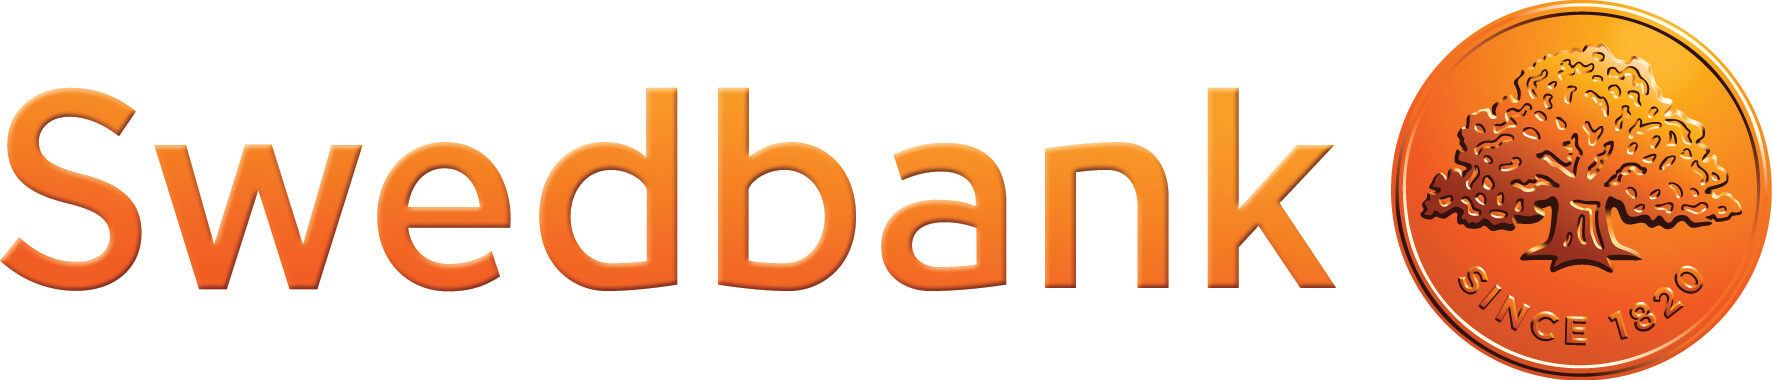 logo Swedbank